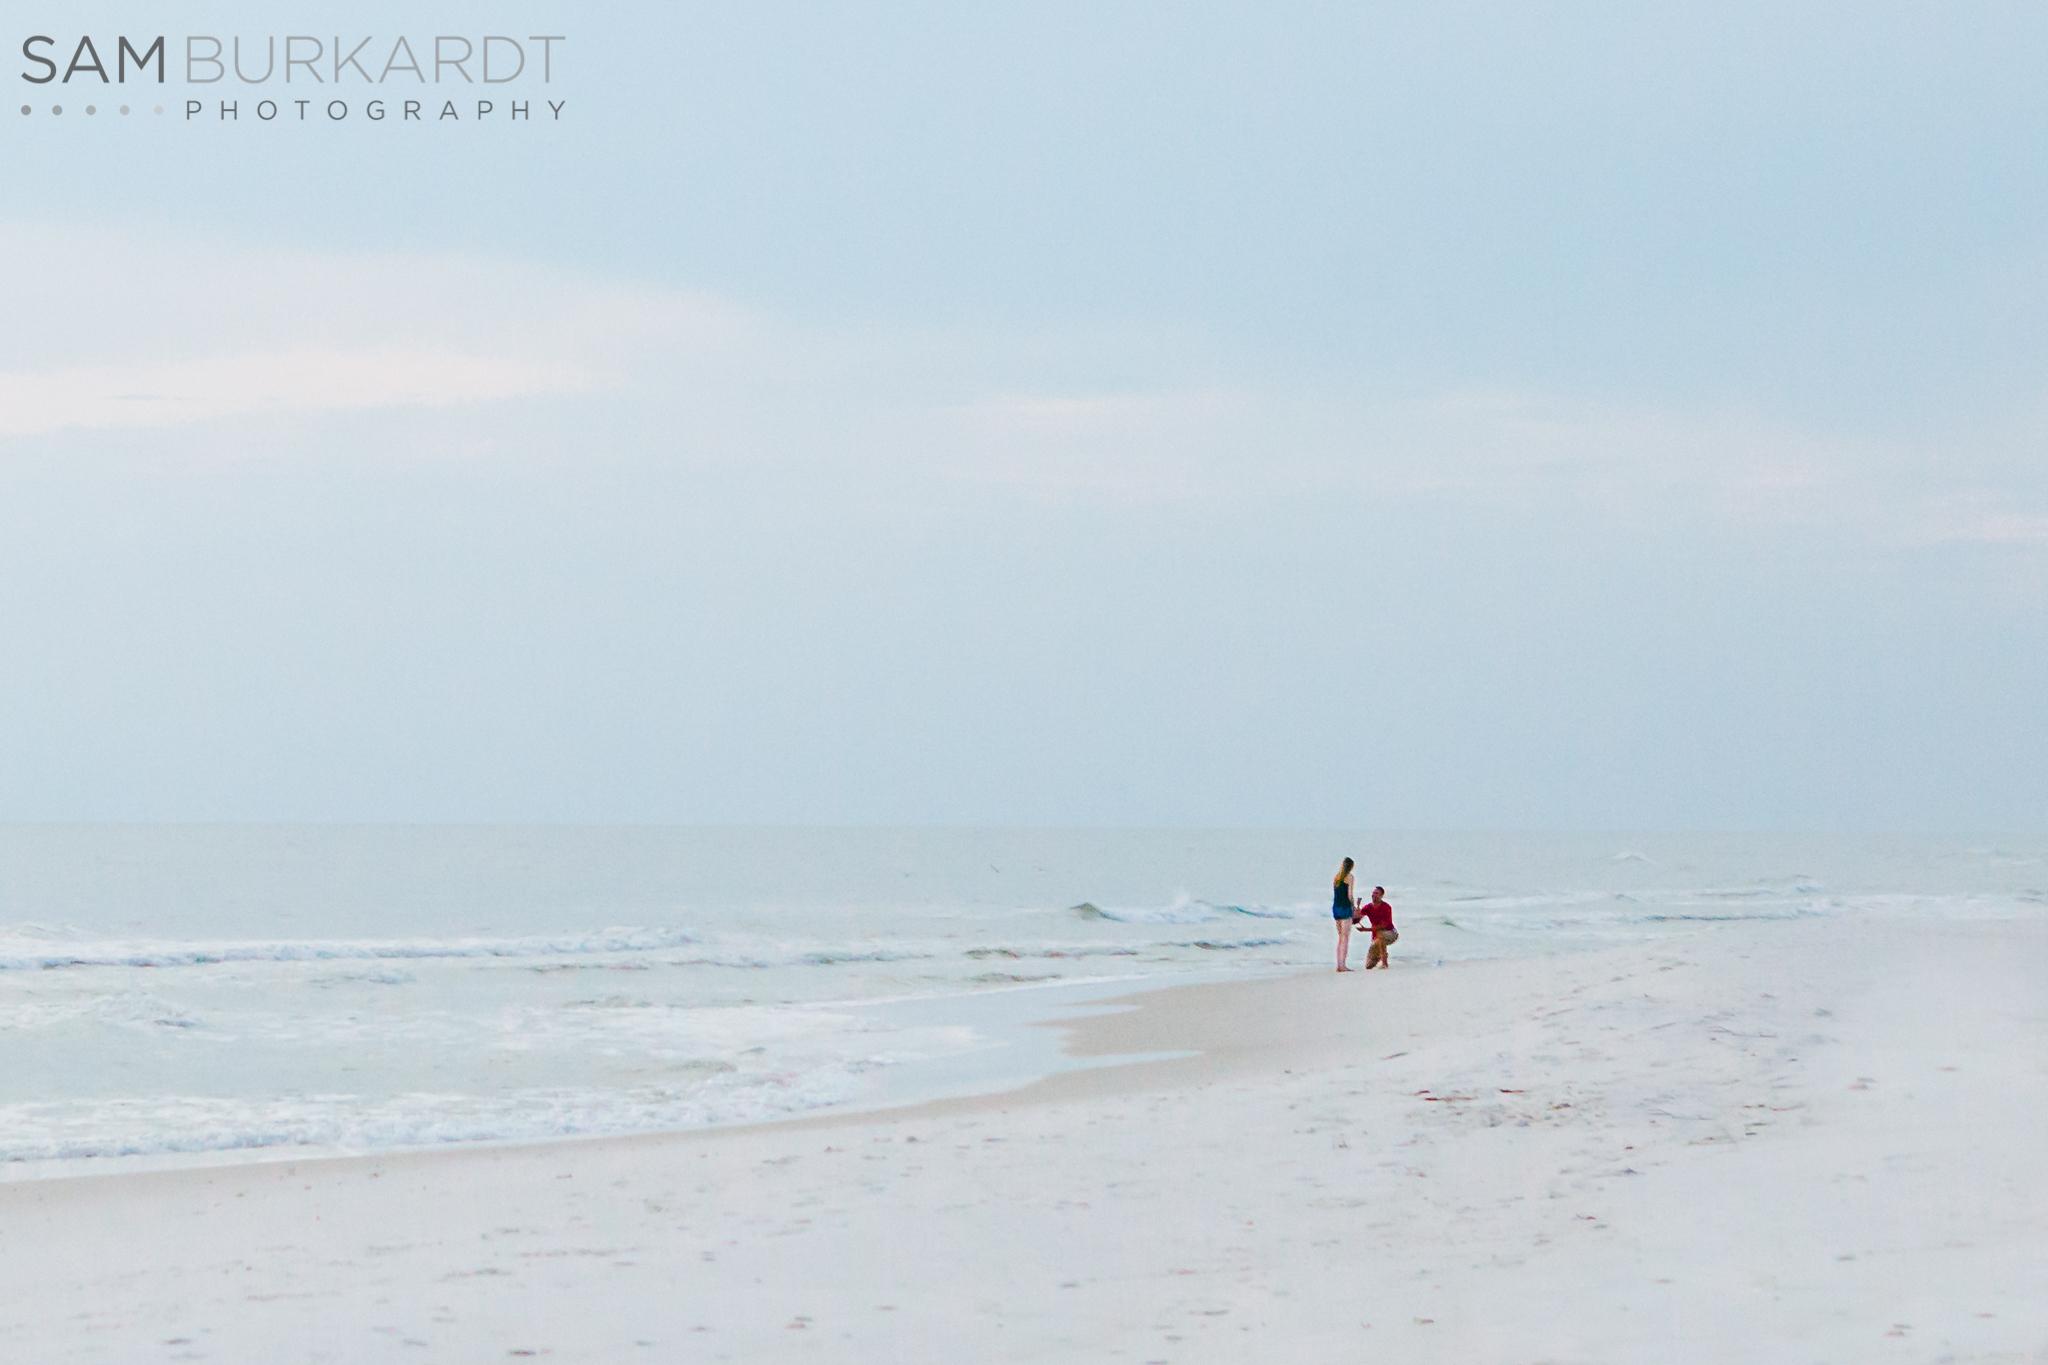 samburkardt_engagement_vacation_beach_cape_san_blas_florida_camping_gopro_0004.jpg